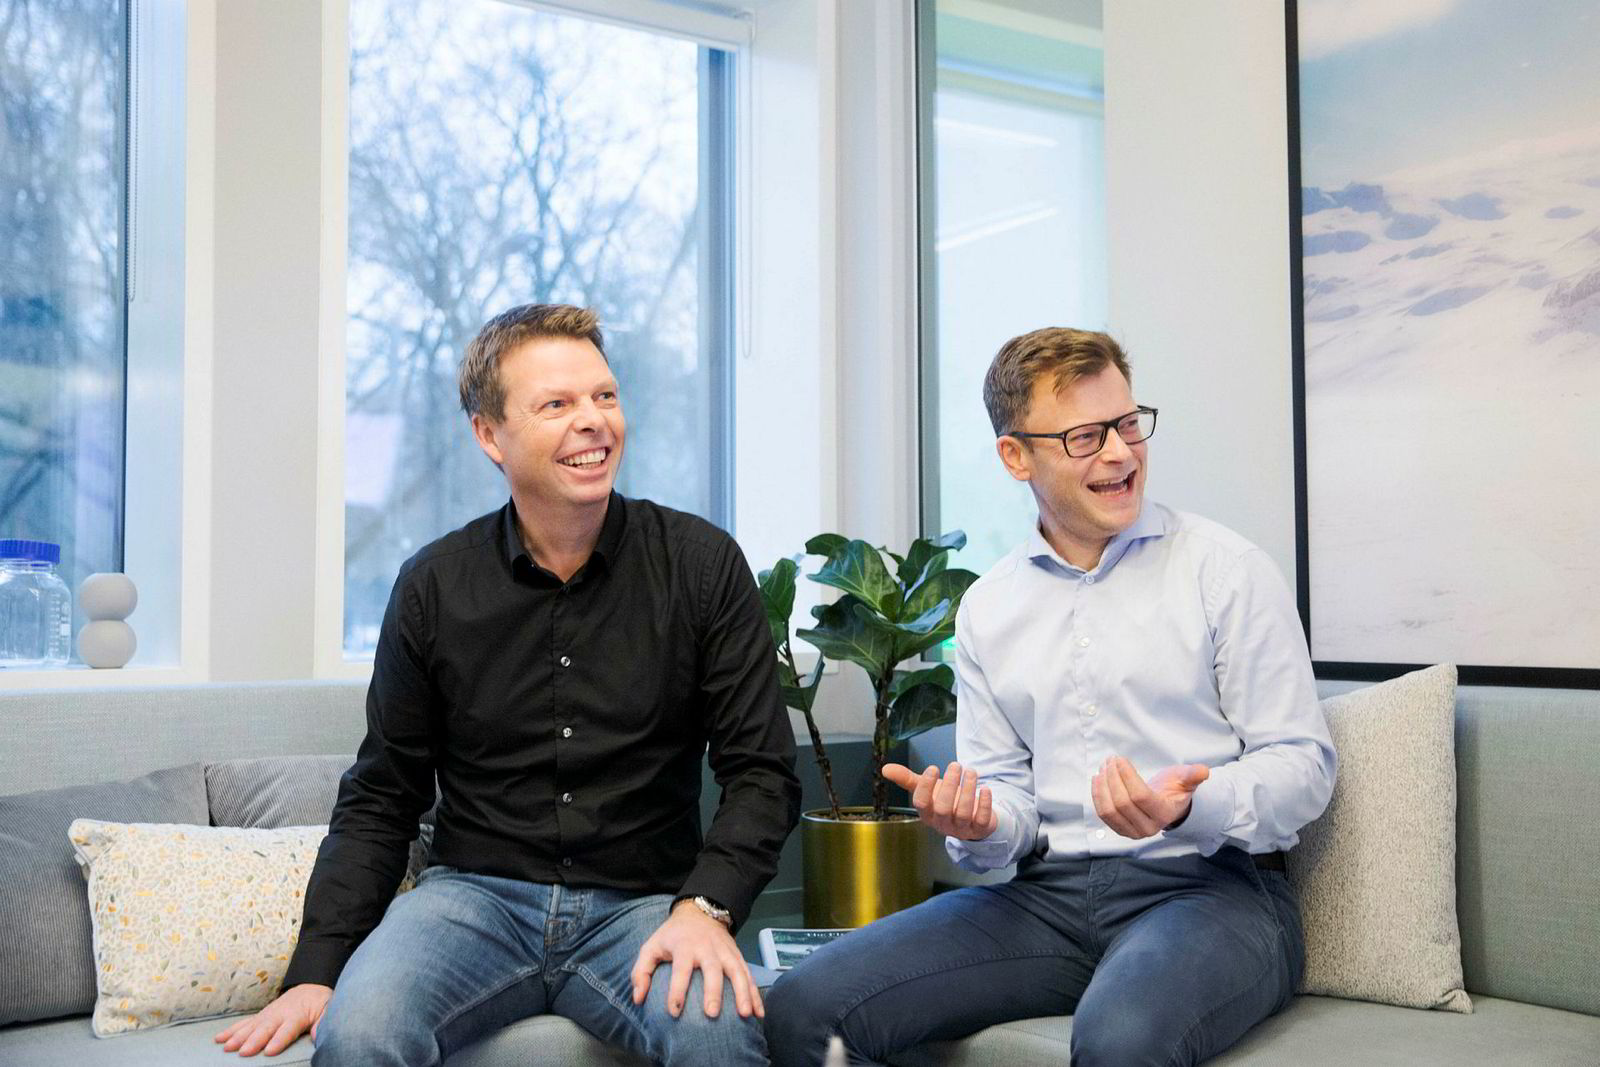 Administrerende direktør Øyvind Birkenes i Airthings og teknologidirektør og medgründer Erlend Bolle.